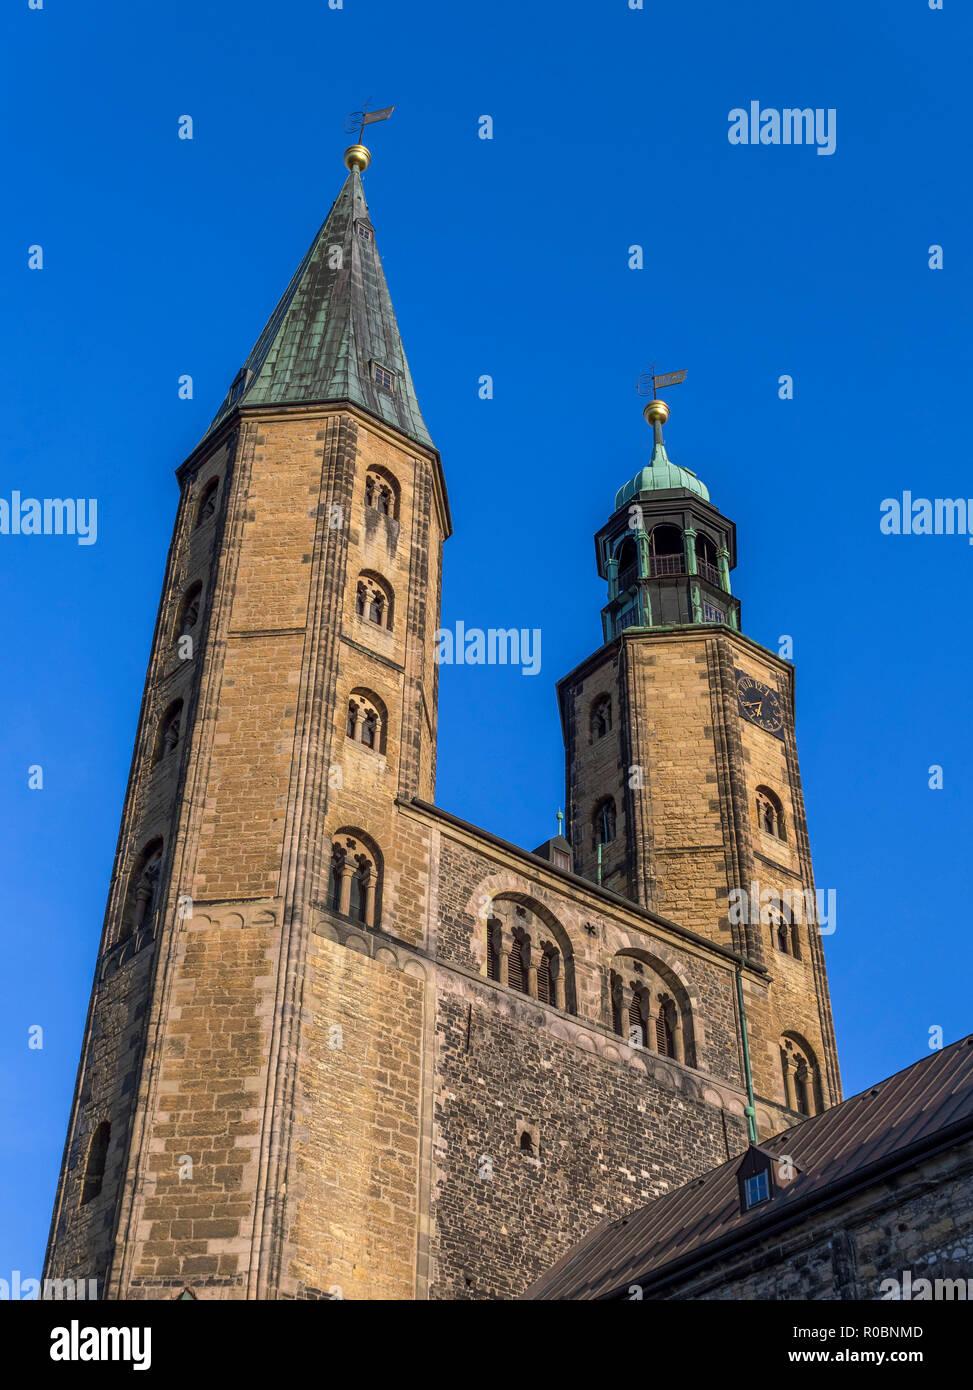 Market Church St. Cosmas and Damian, Historic City in Goslar, UNESCO World Heritage Site, Goslar, Harz, Lower Saxony, Germany, Europe - Stock Image